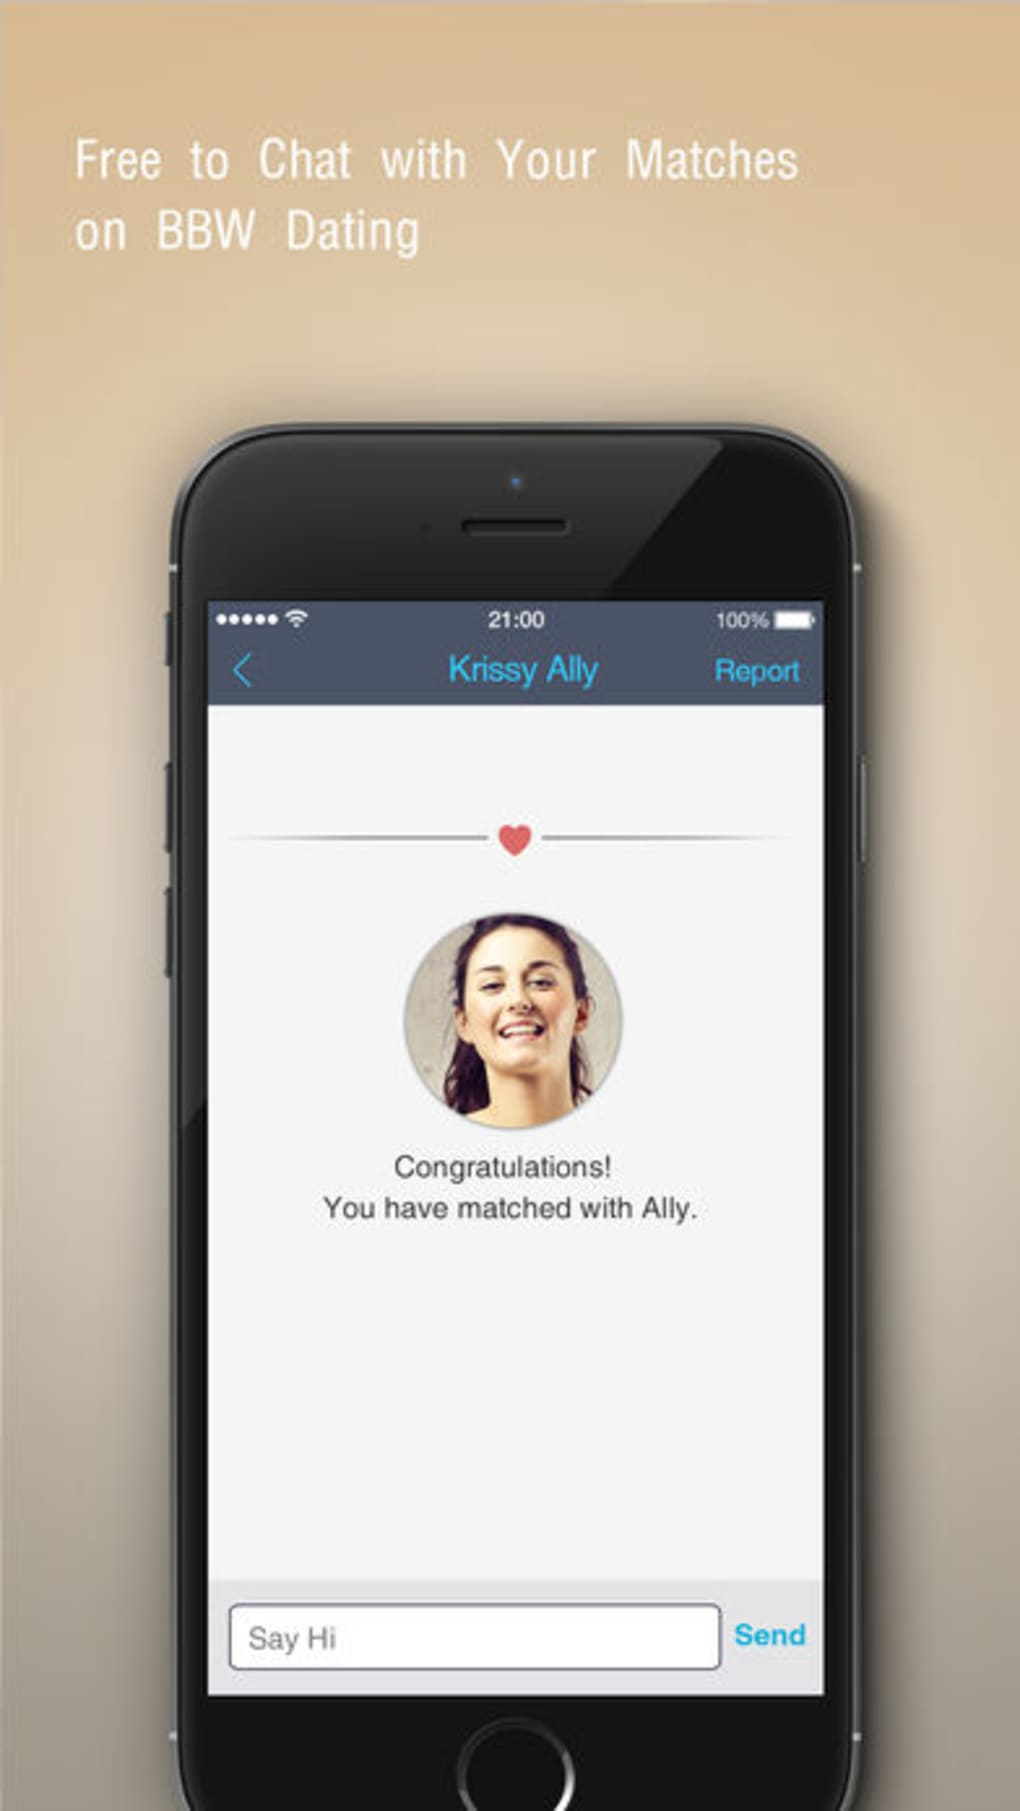 1 bbw dating app - bustr for iphone - download